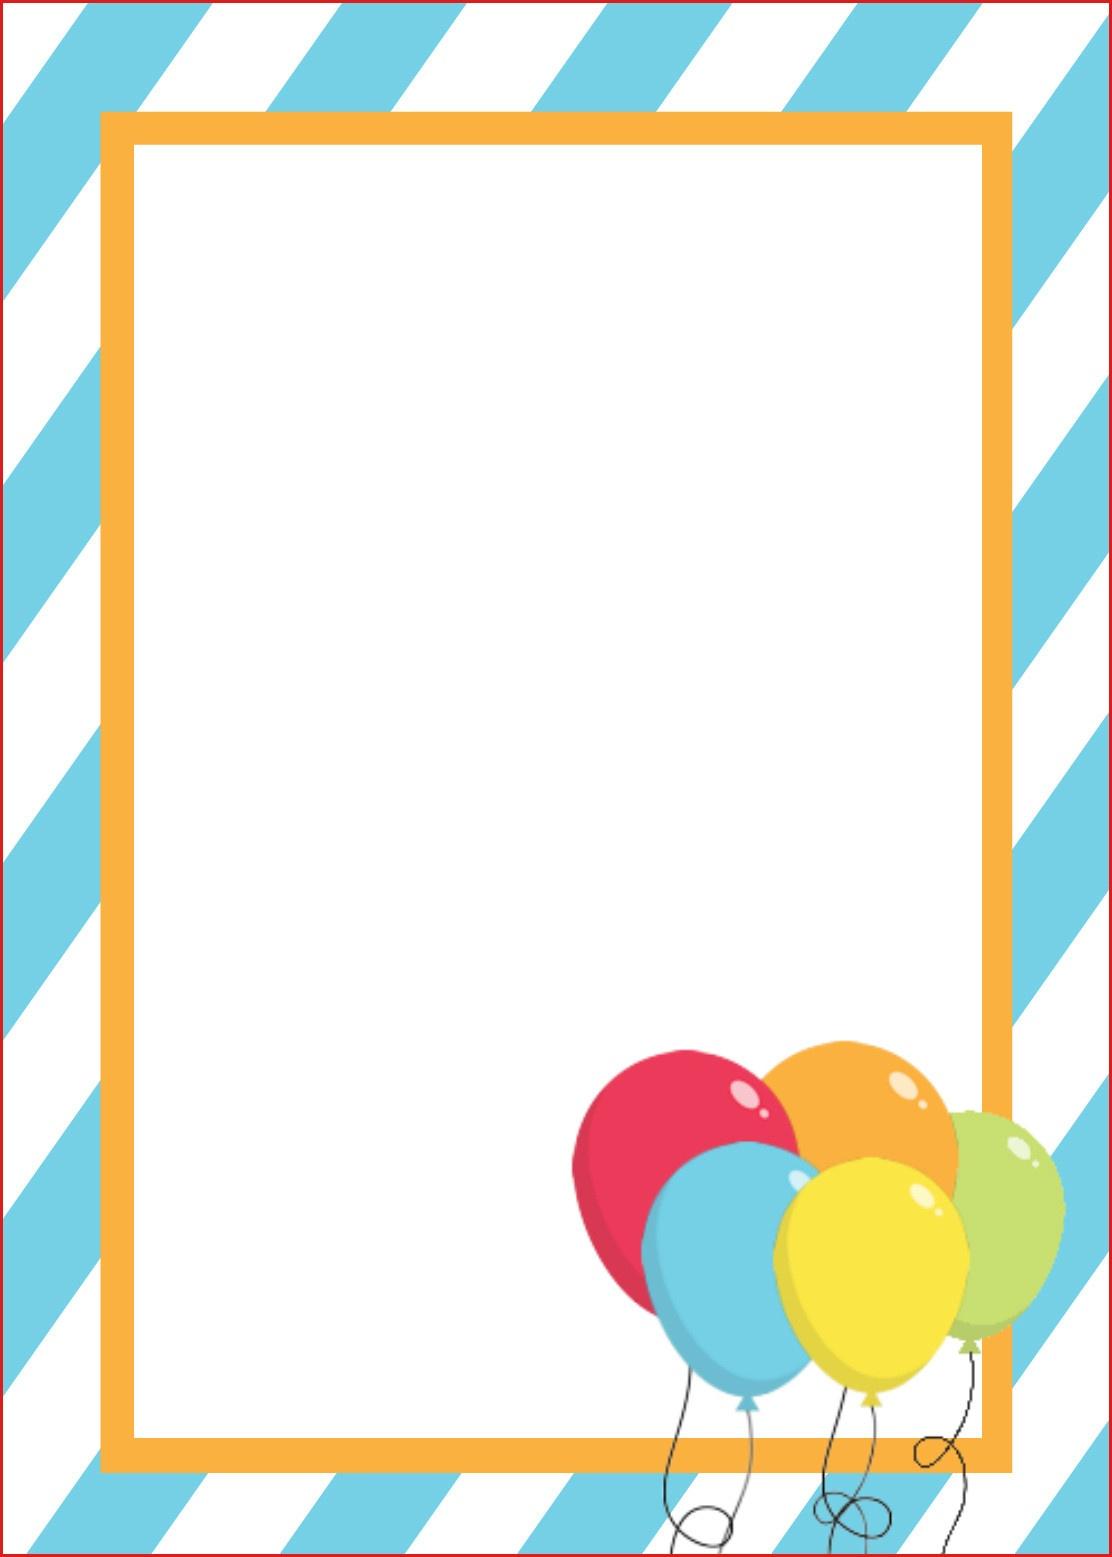 Free Printable Birthday Invitation Templates Birthday Cards - Customized Birthday Cards Free Printable